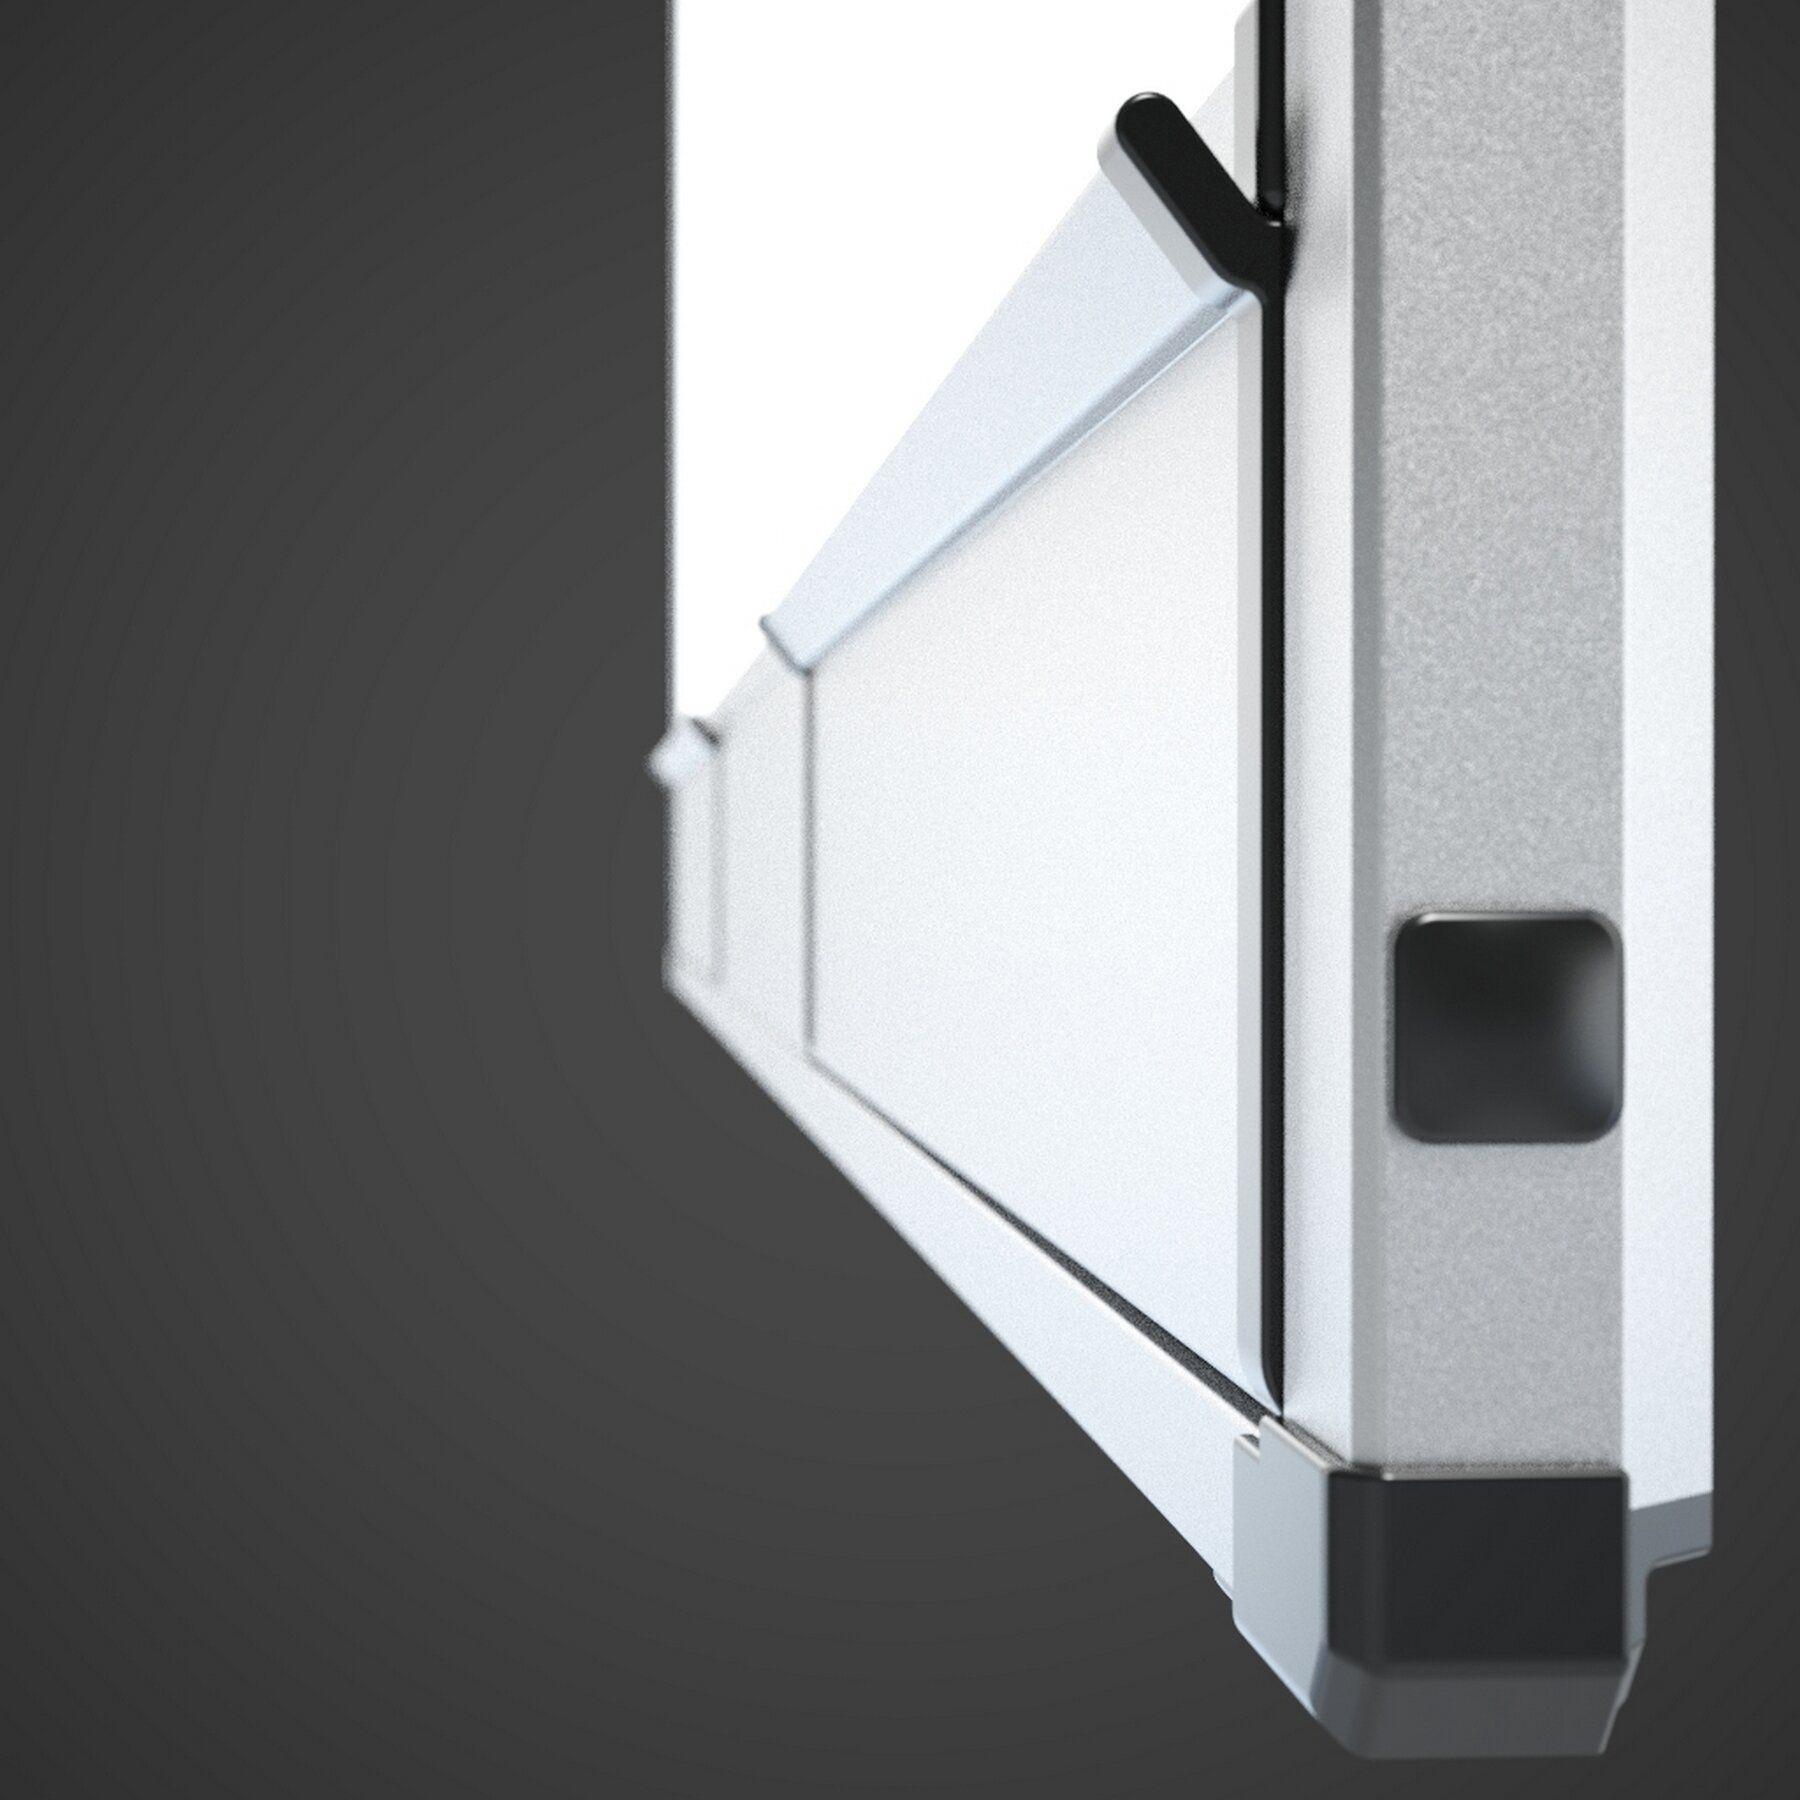 Доска белая магнитная сухостираемая StarBoard 100*150см., алюминиевая рамка, керамика 2x3 - фото 7